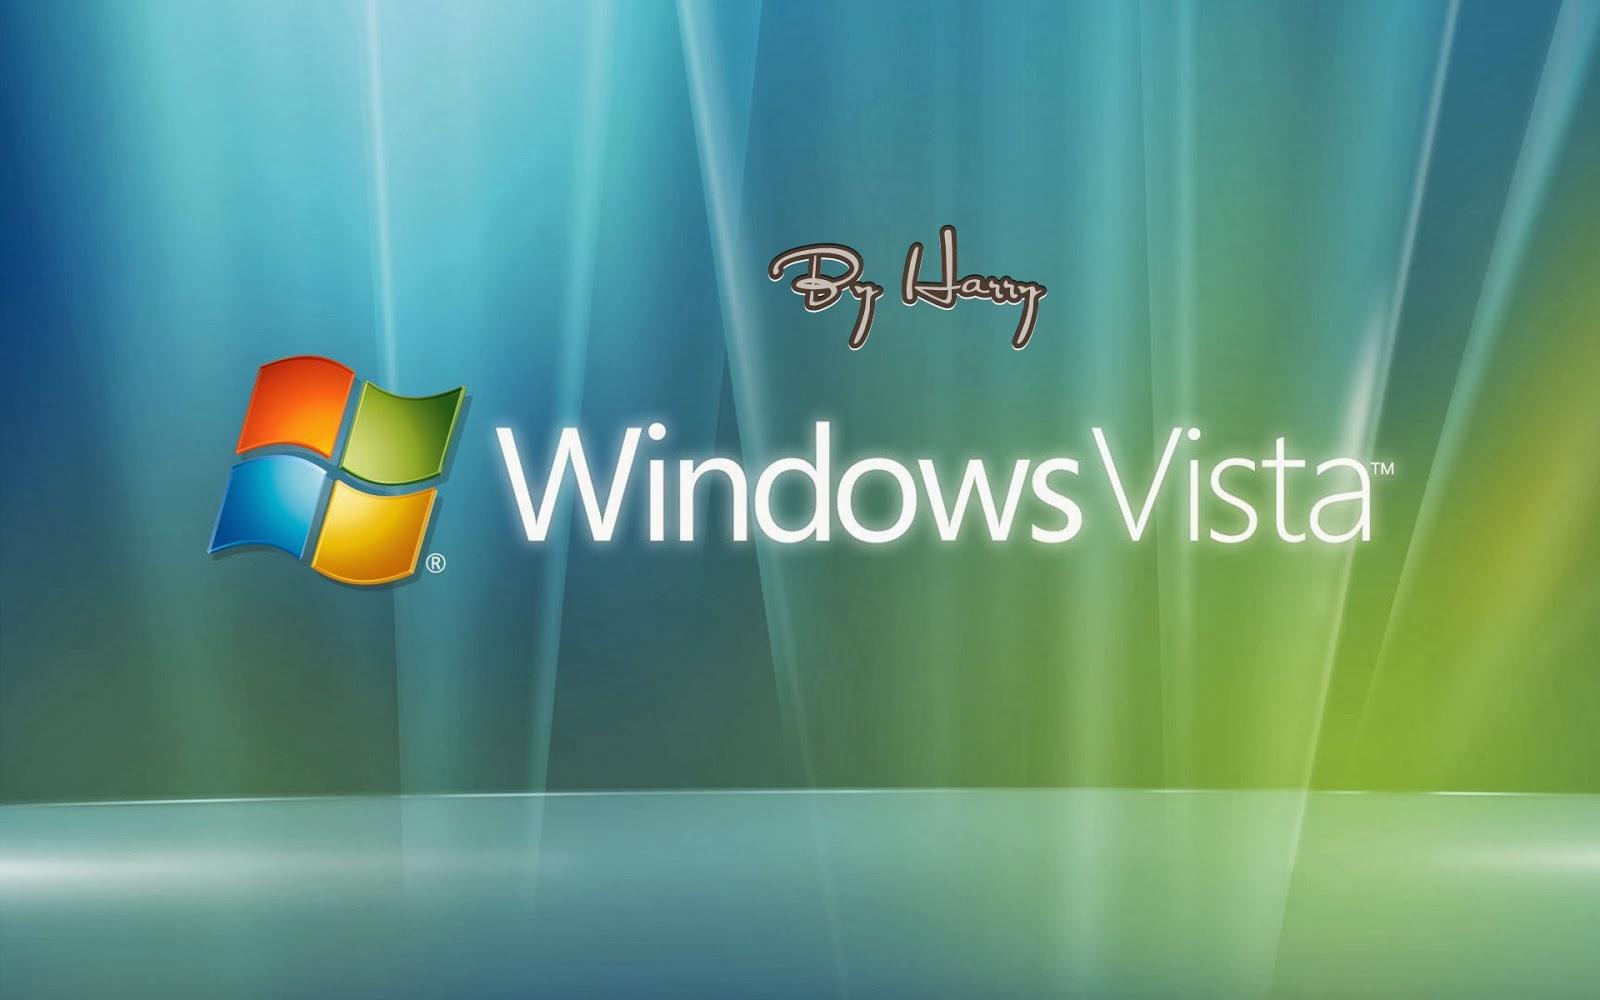 http://wdigitalb.blogspot.in/2015/06/windows-vista-highly-compressed-2-mb.html